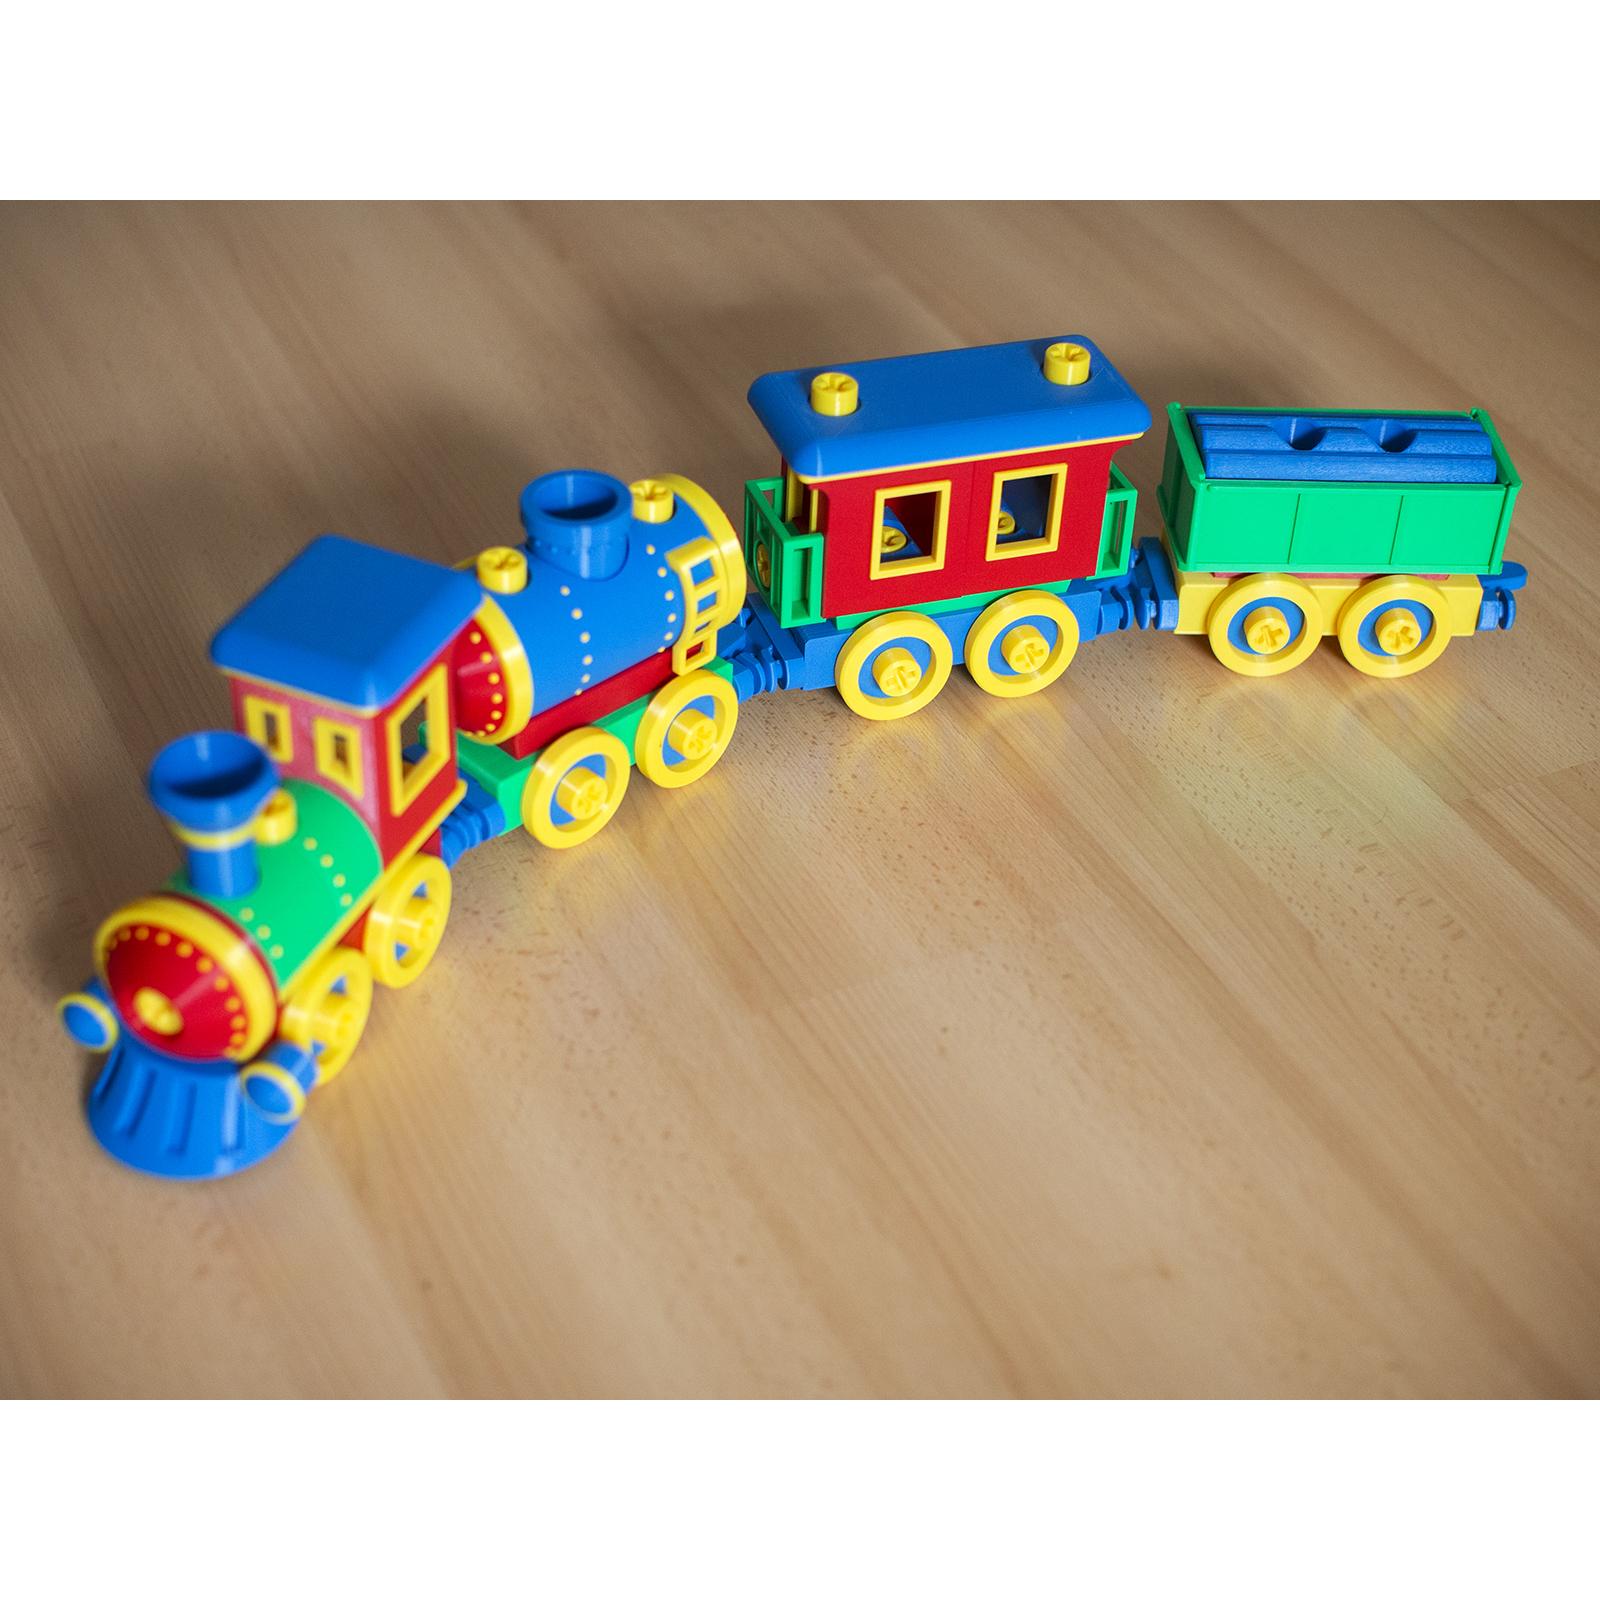 6.jpg Download STL file Toy train construction set - whole train combo • 3D print object, kozakm